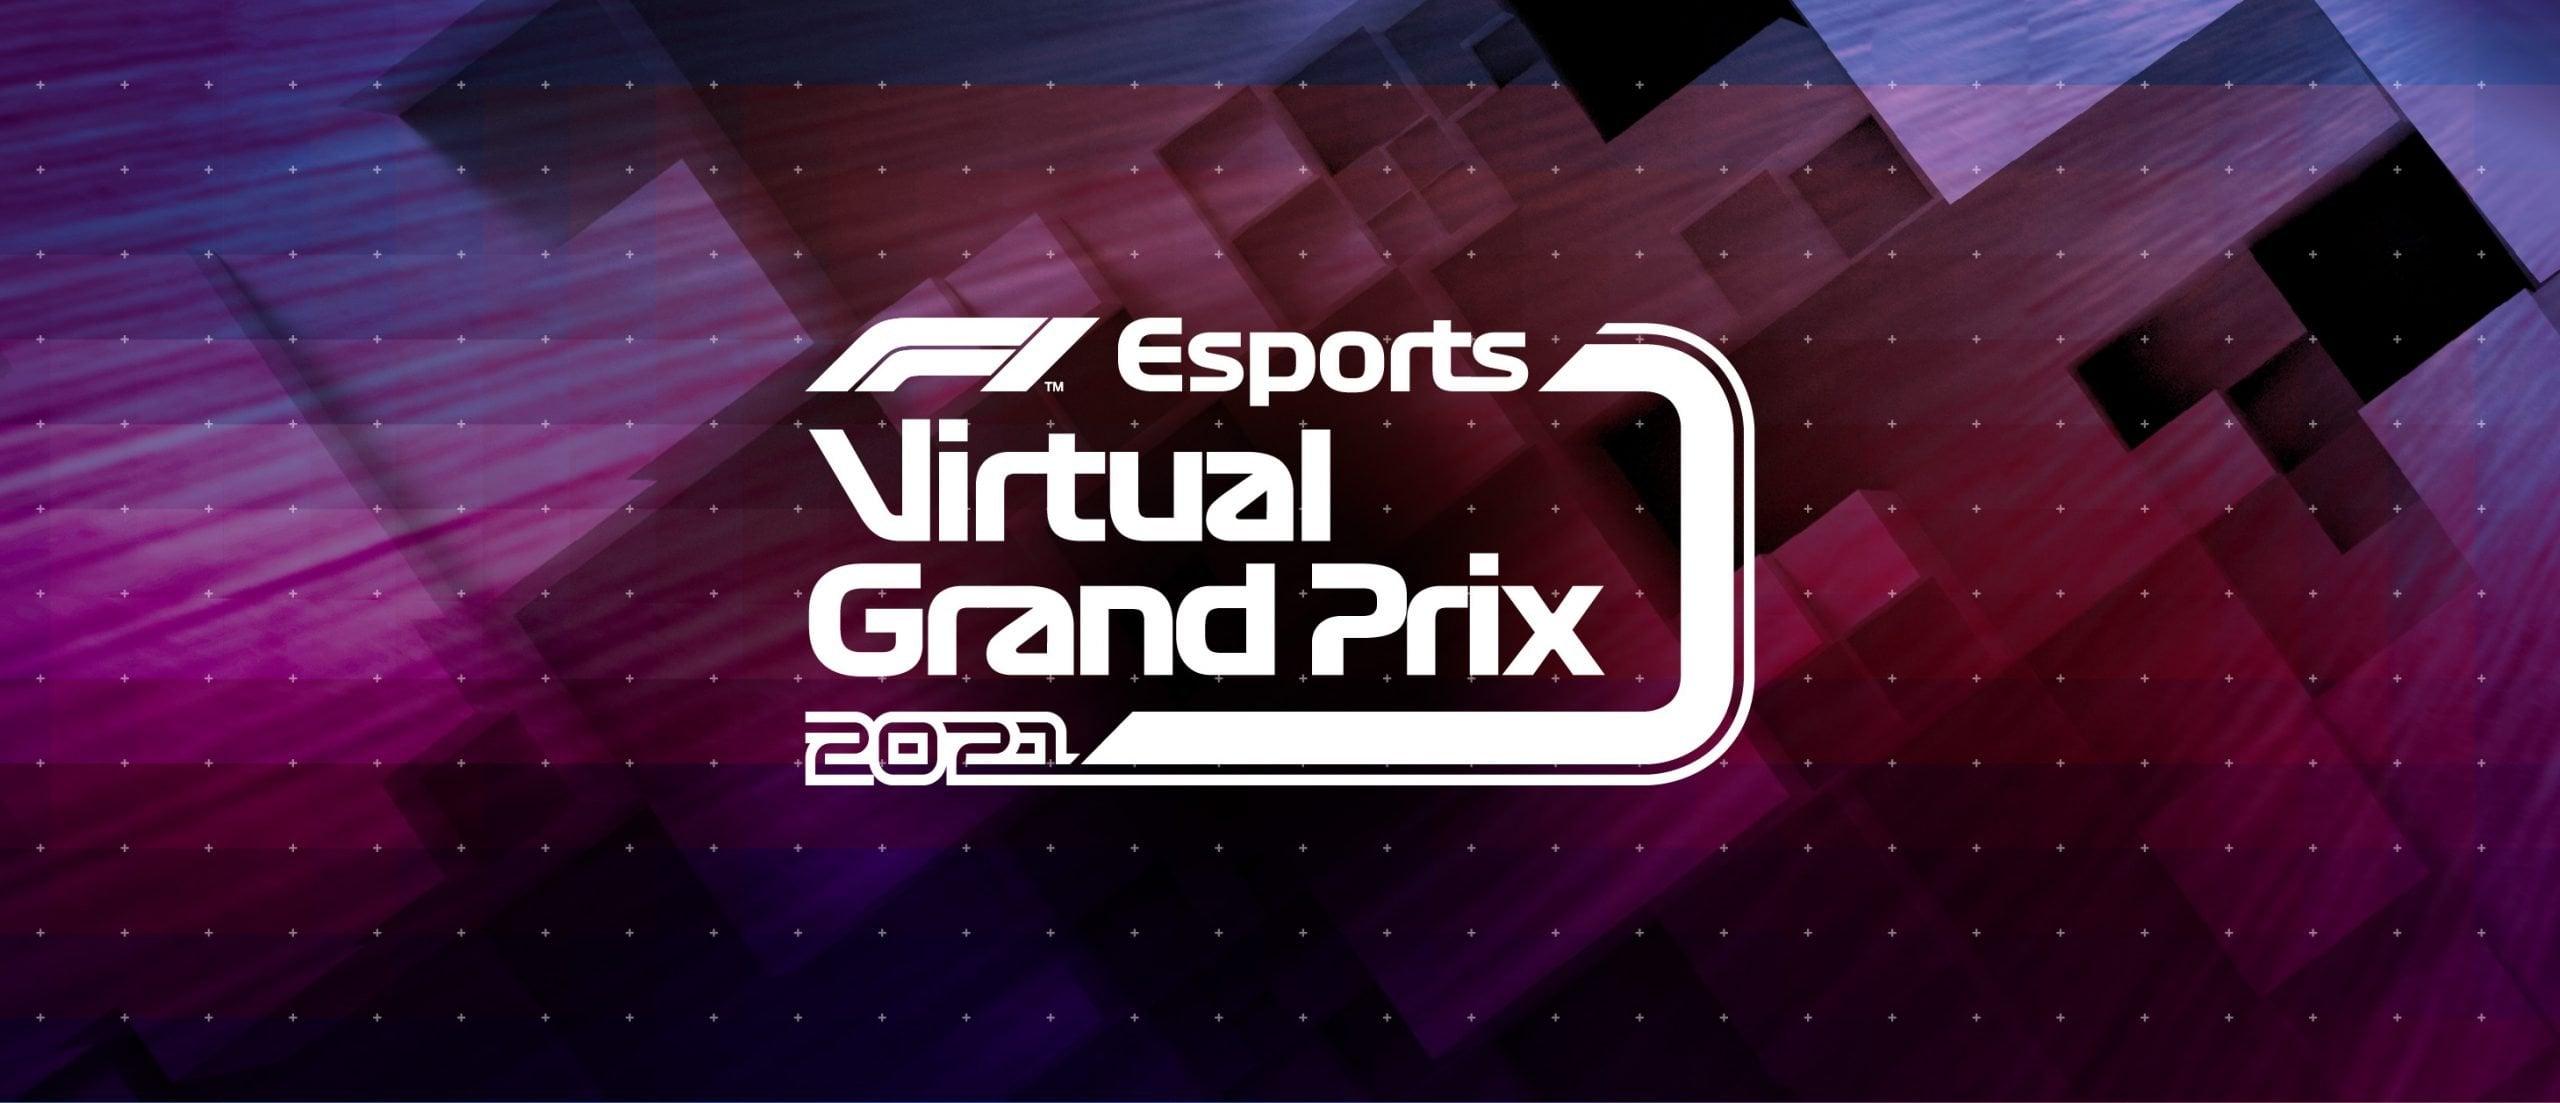 alpine f1 team virtual grand prix 2021